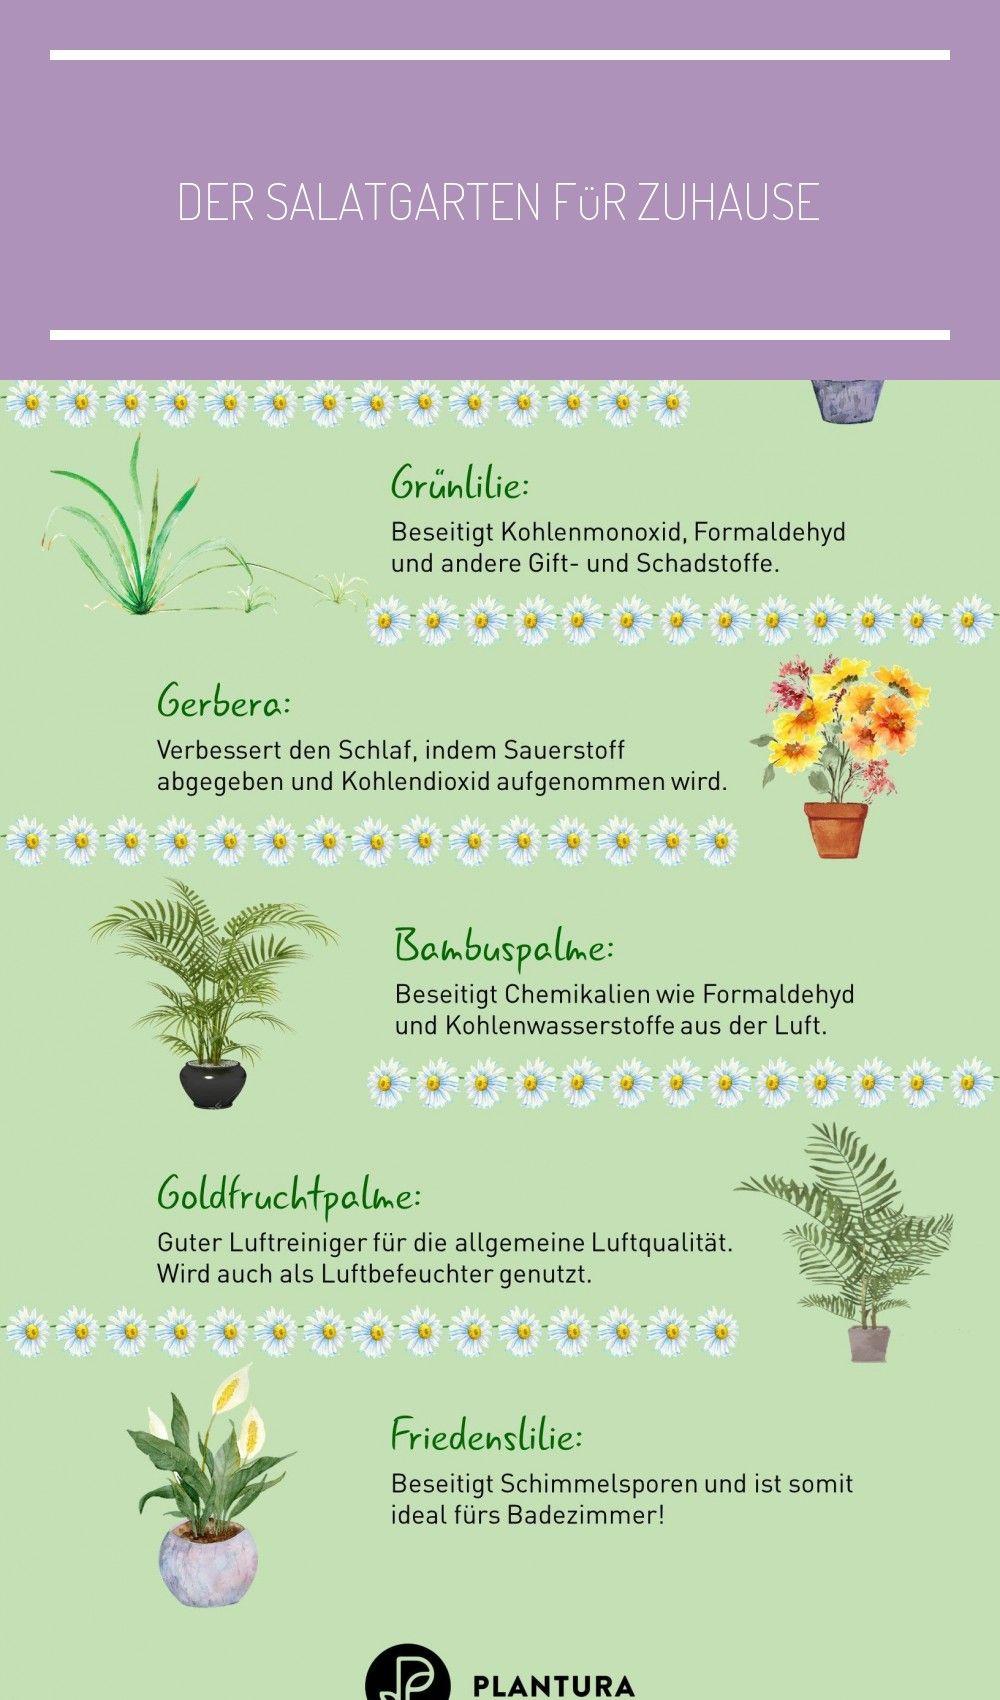 Der Salatgarten Fur Zuhause In 2020 Crochet Basics Basic Crochet Stitches Yarn Over